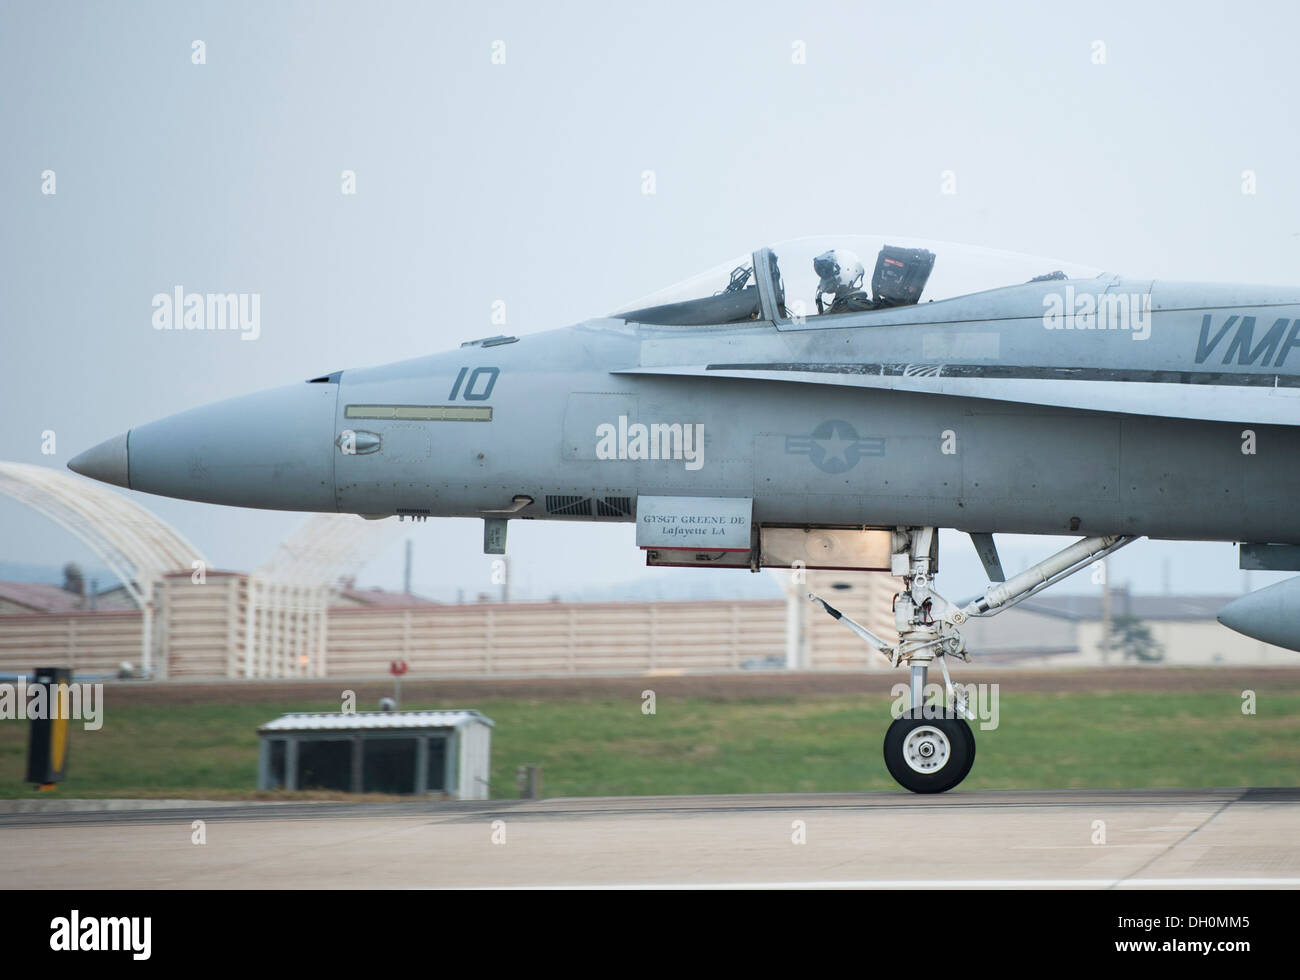 A U.S. Marine F-18 Hornet, from Iwakuni Marine Corps Air Station, Japan, takes off during Max Thunder 13-2 at Kunsan Air Base, Republic of Korea, Oct. 28, 2013. U.S. Air Force Airmen, U.S. Air Force Airmen, U.S. Marines and Republic of Korea air forces ki - Stock Image